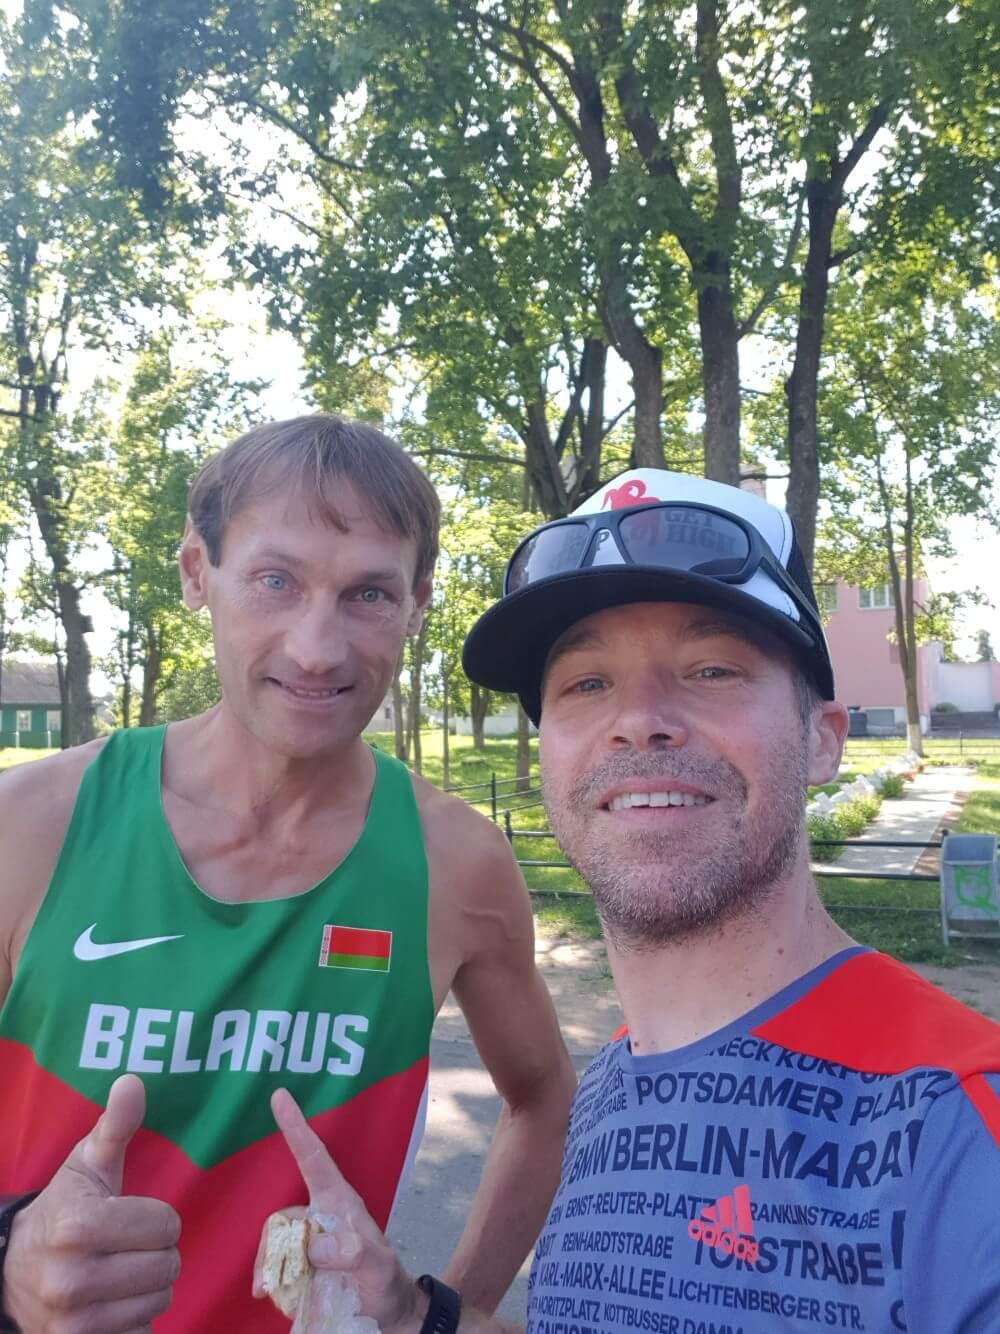 run.belarus.ultrarunner